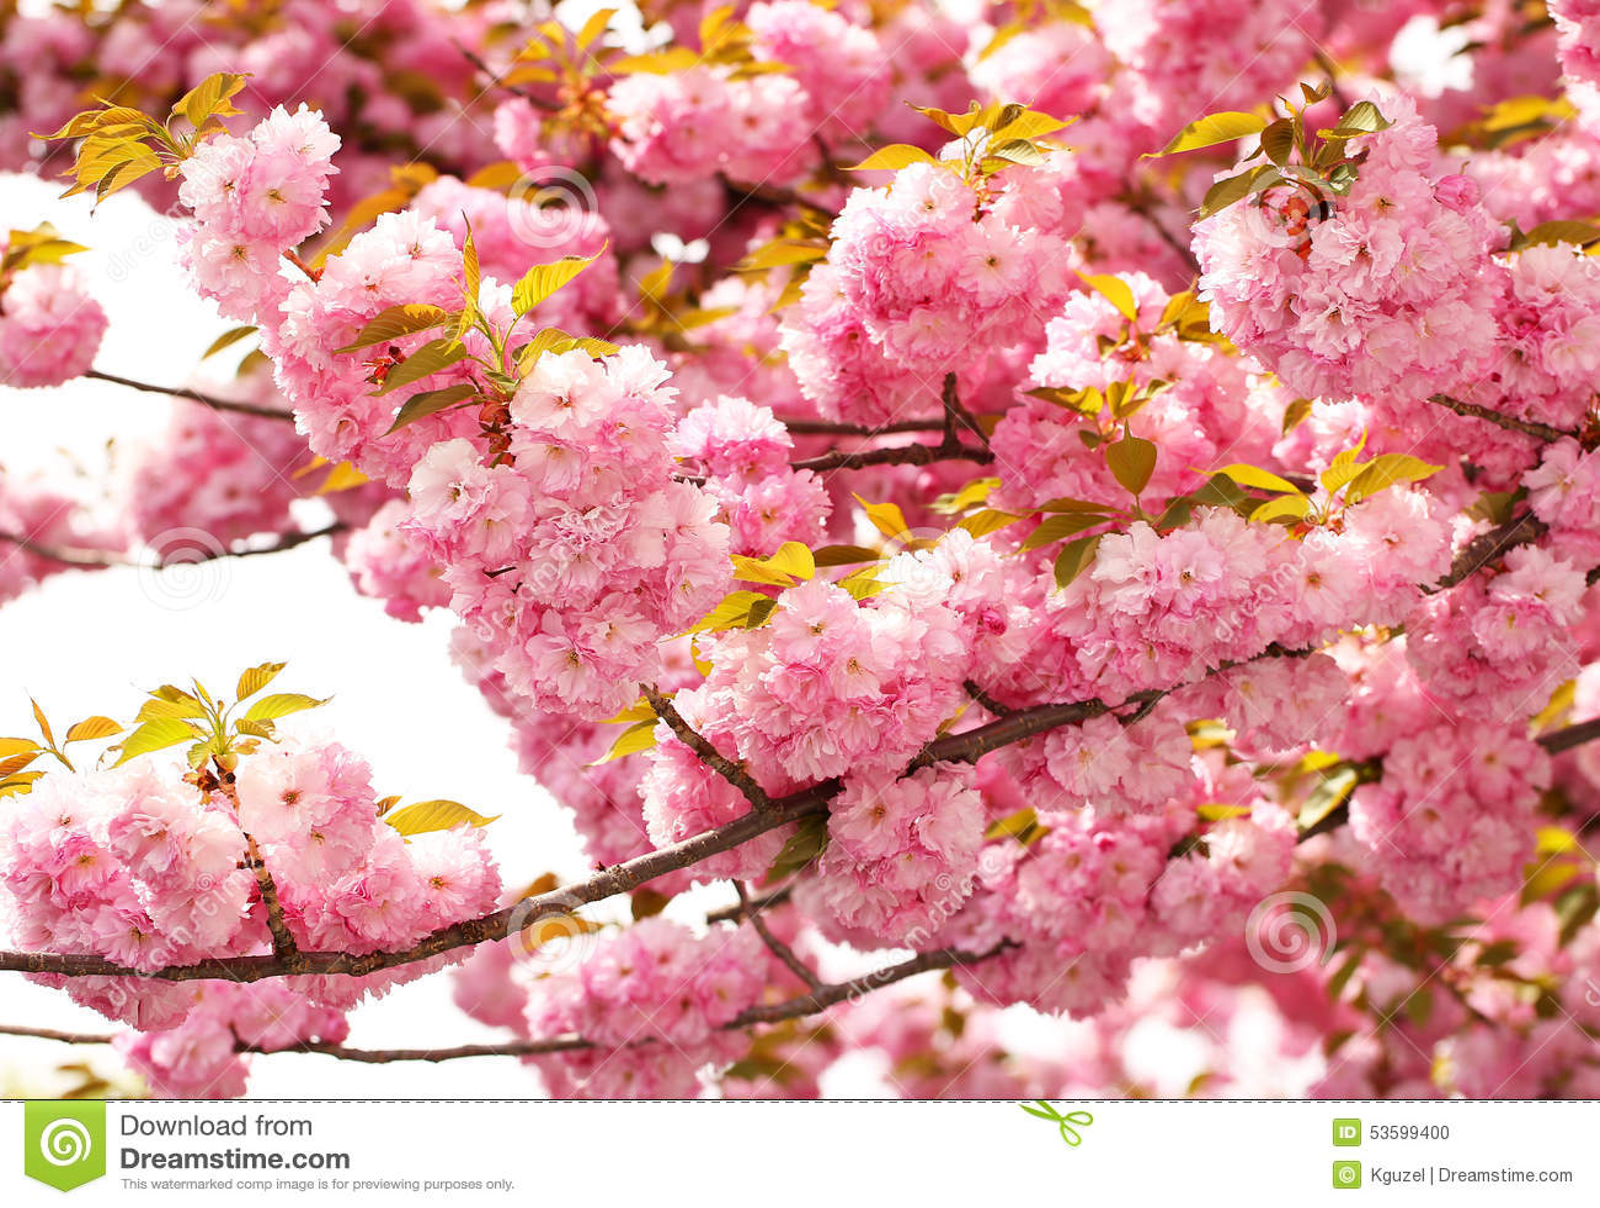 flor de cerejeira na primavera flores corderosa sakura foto de stock